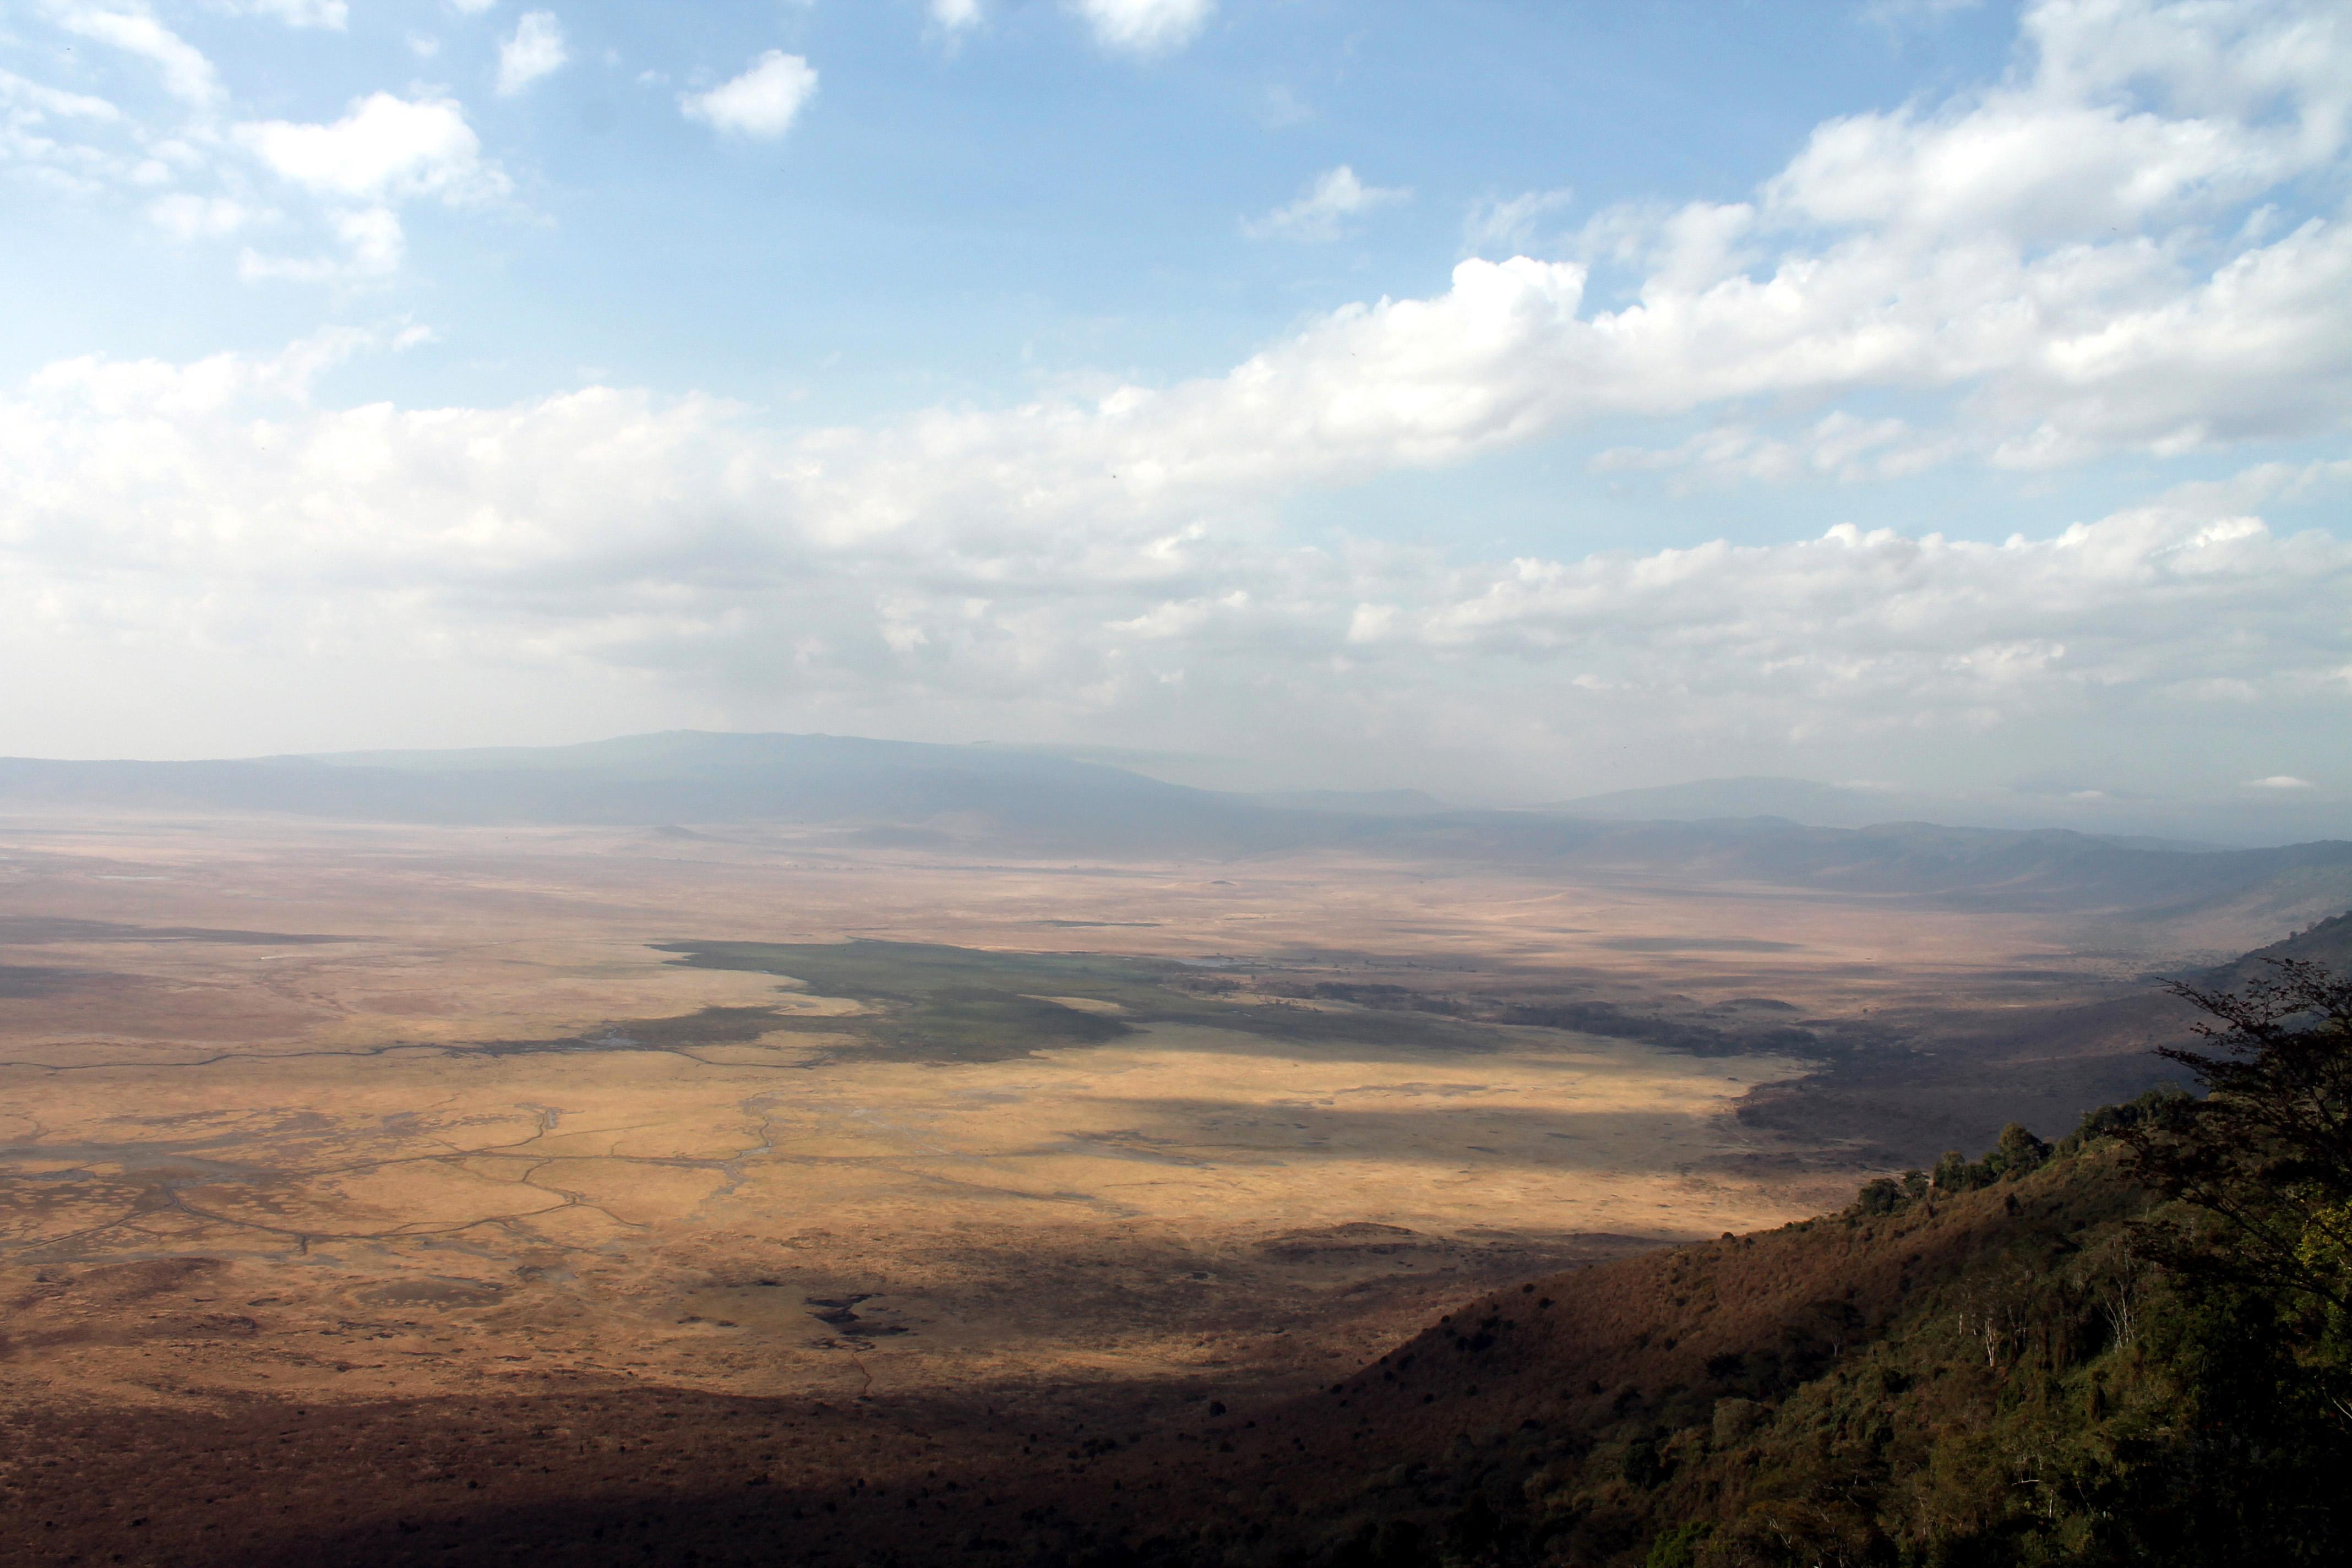 View on Ngorongoro Crater